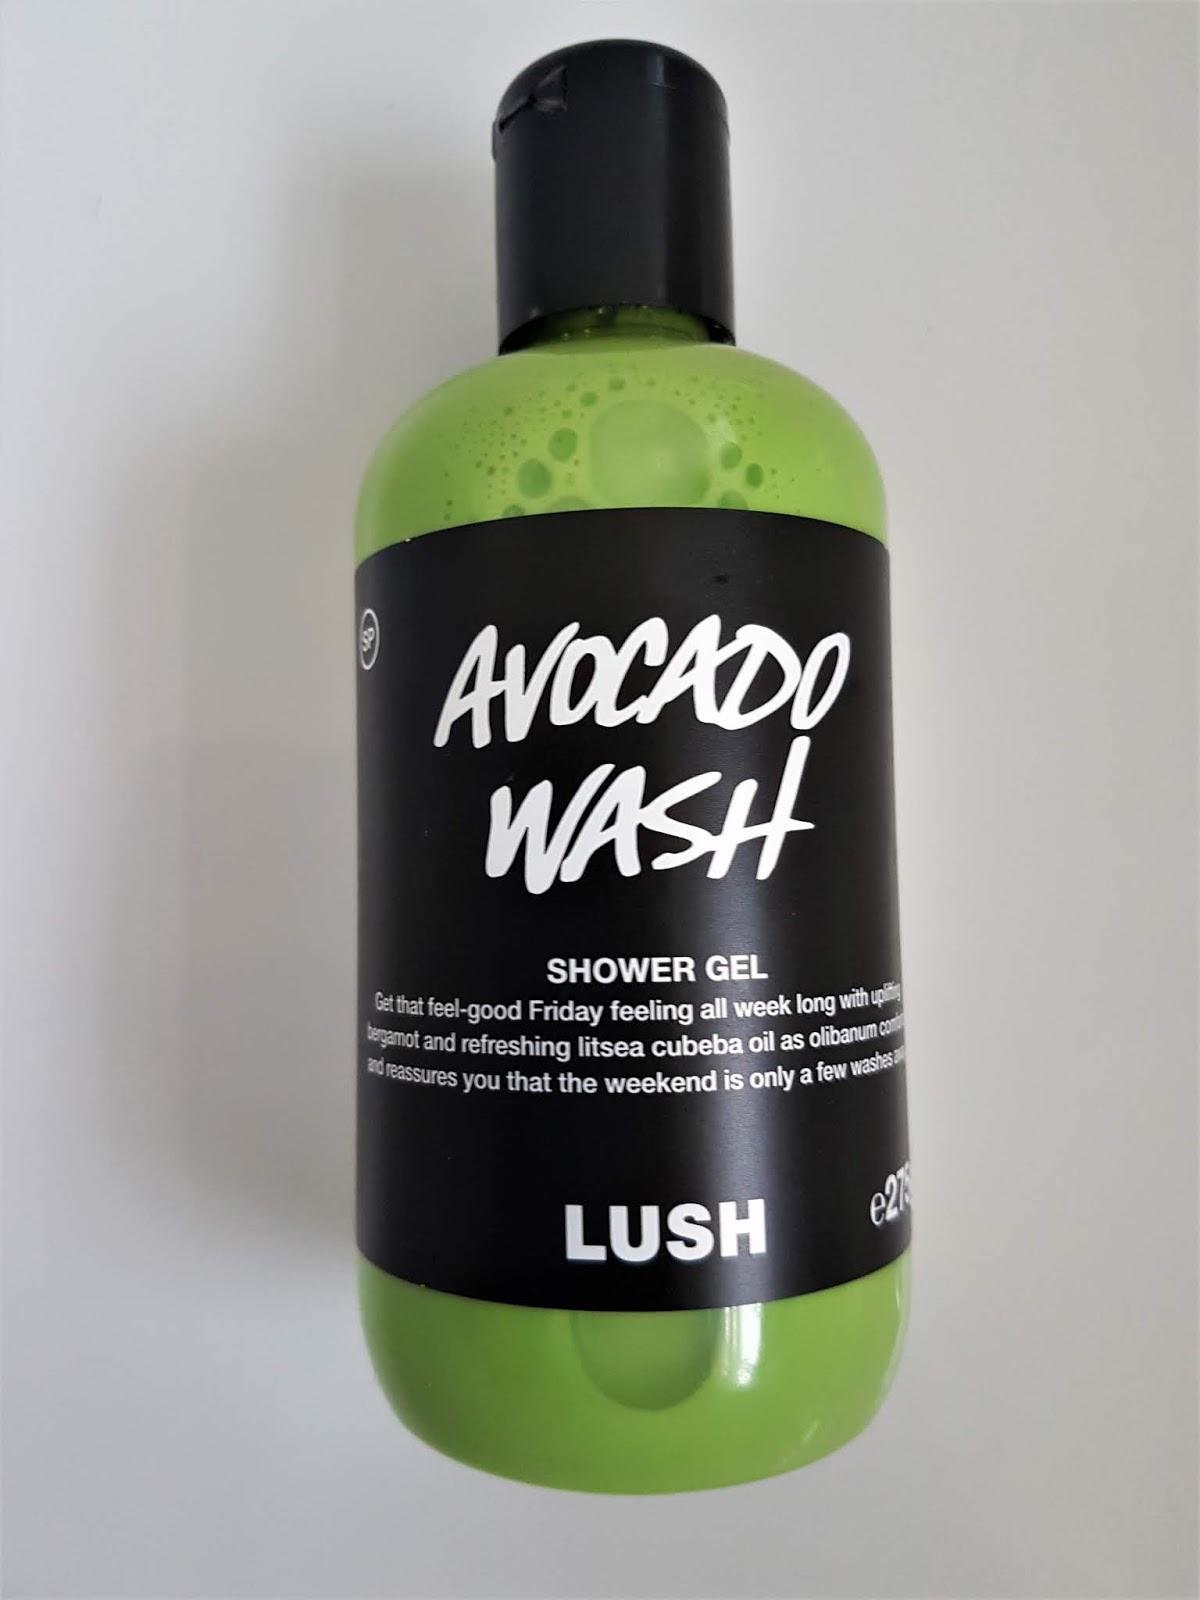 Avocado Wash Shower Gel - Guacs My World   The Lush Box